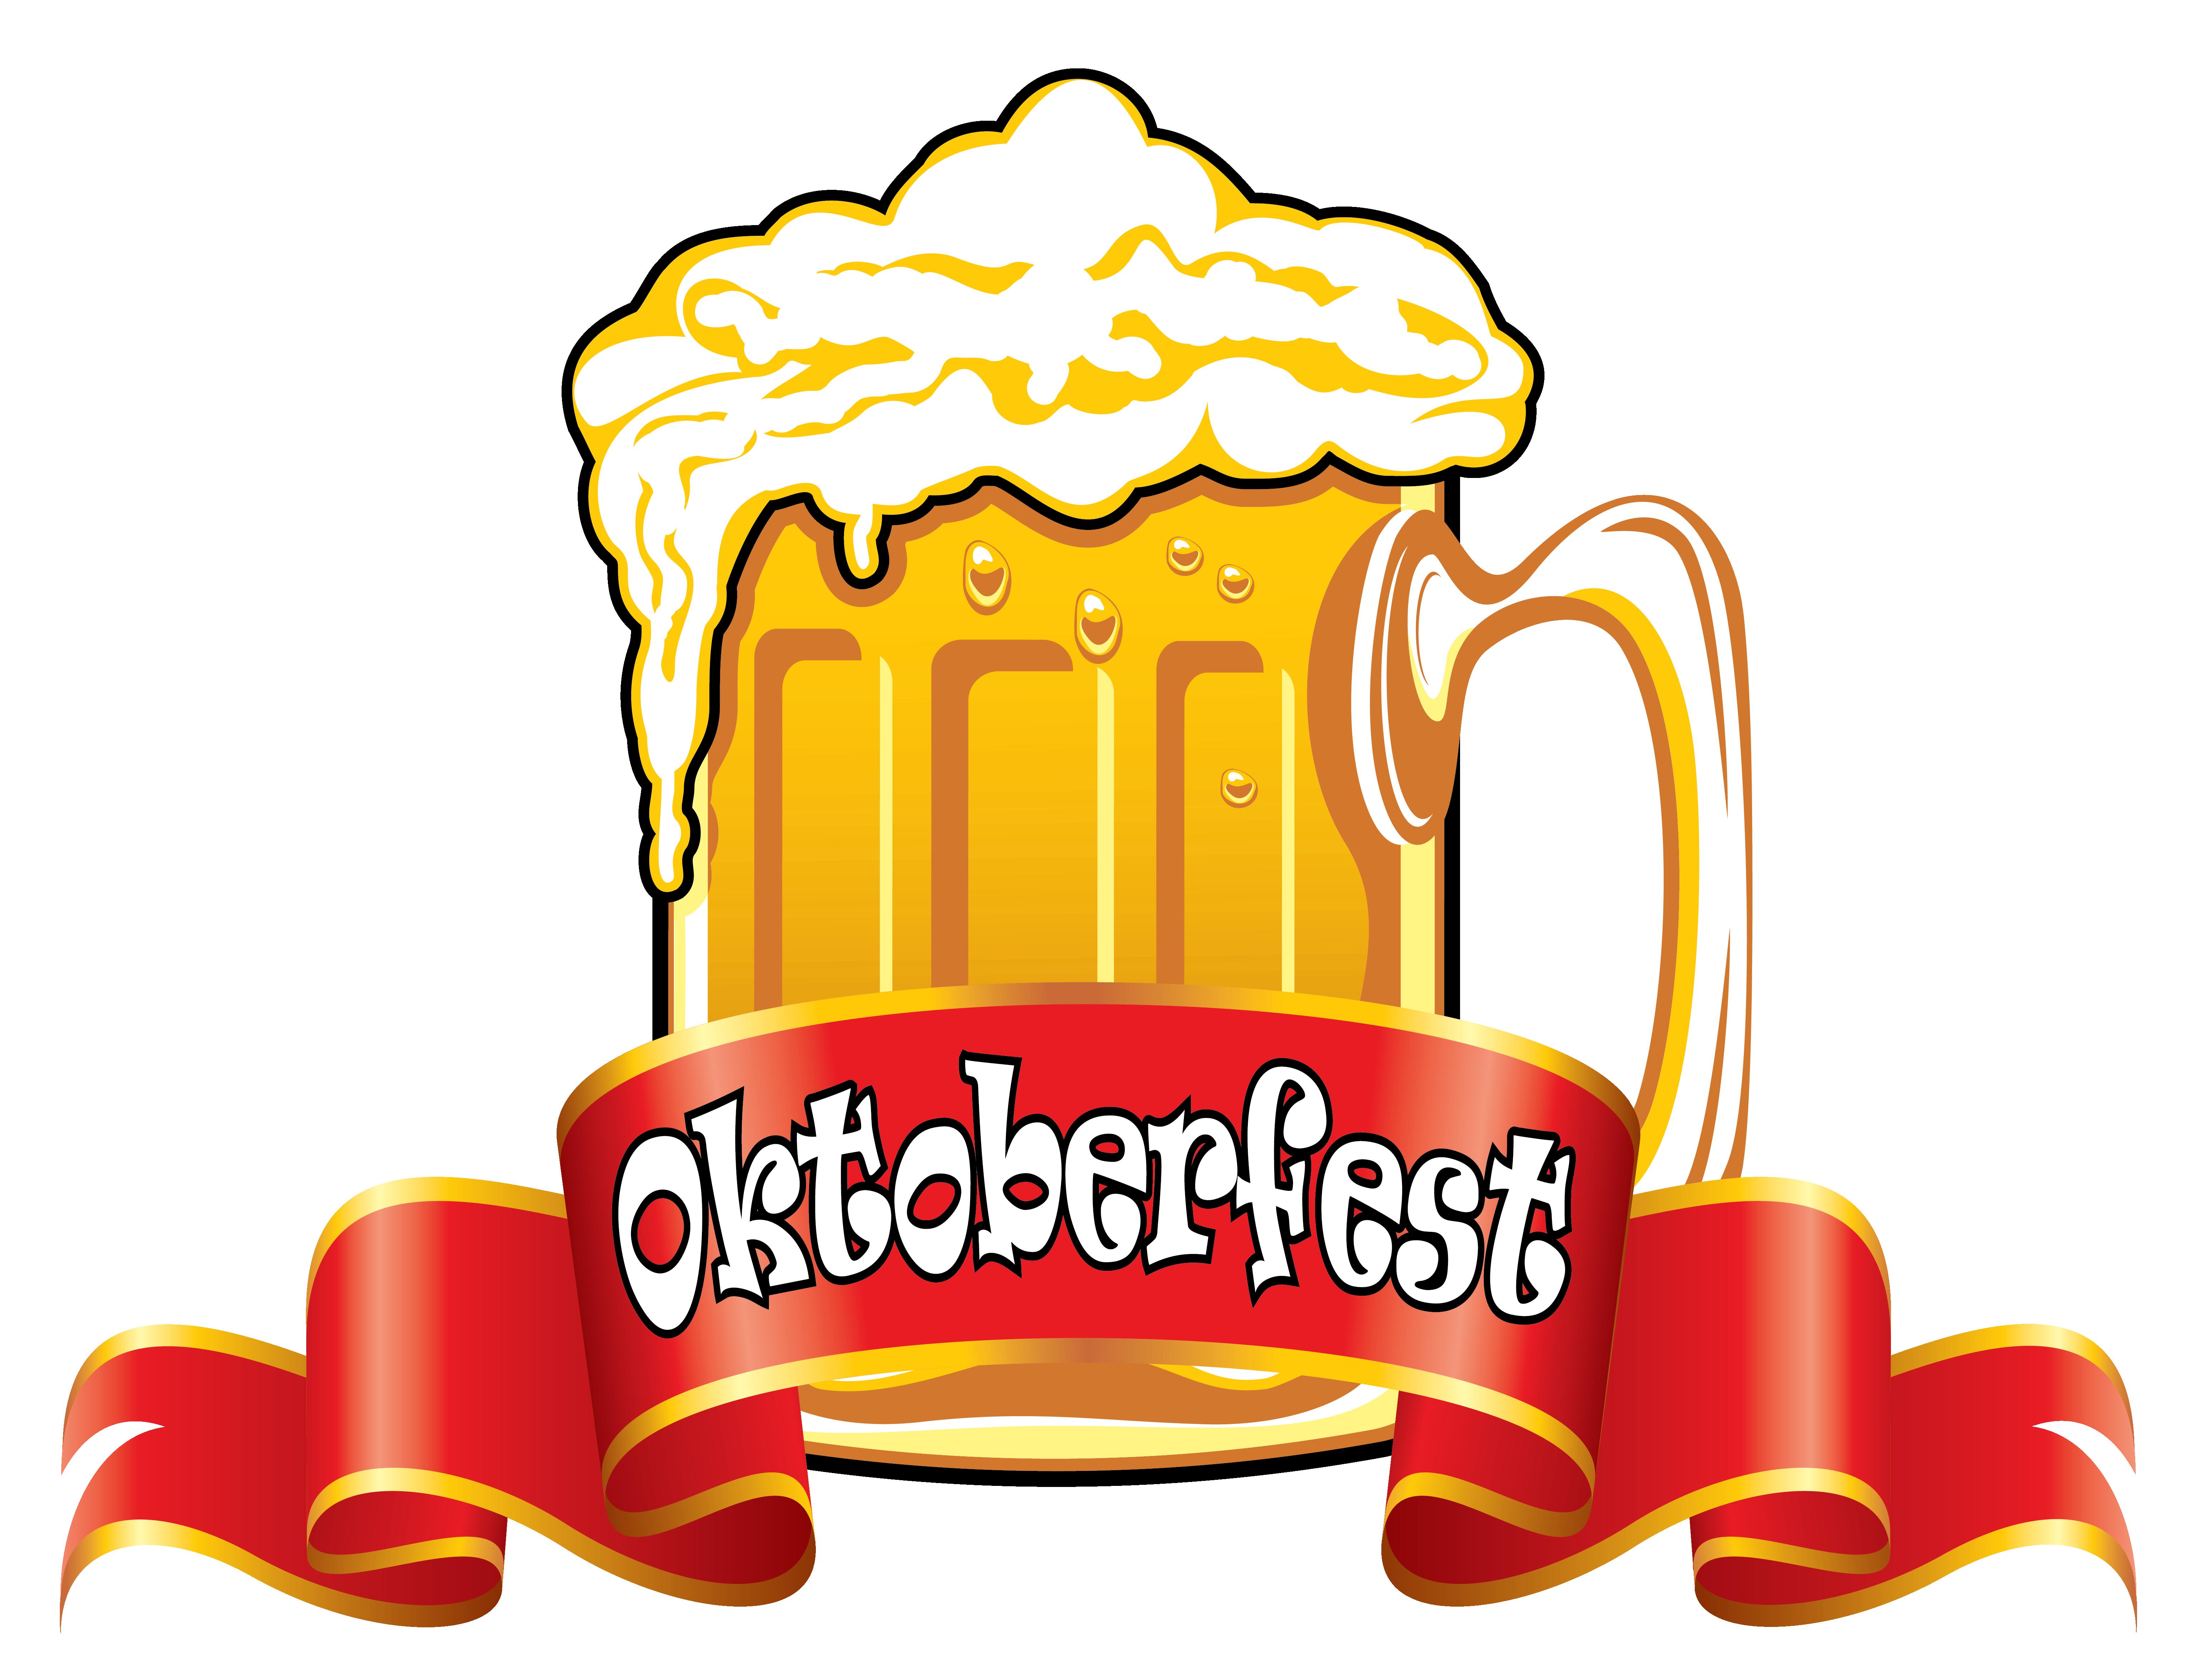 6175x4717 15 Oktoberfest Vector For Free Download On Mbtskoudsalg